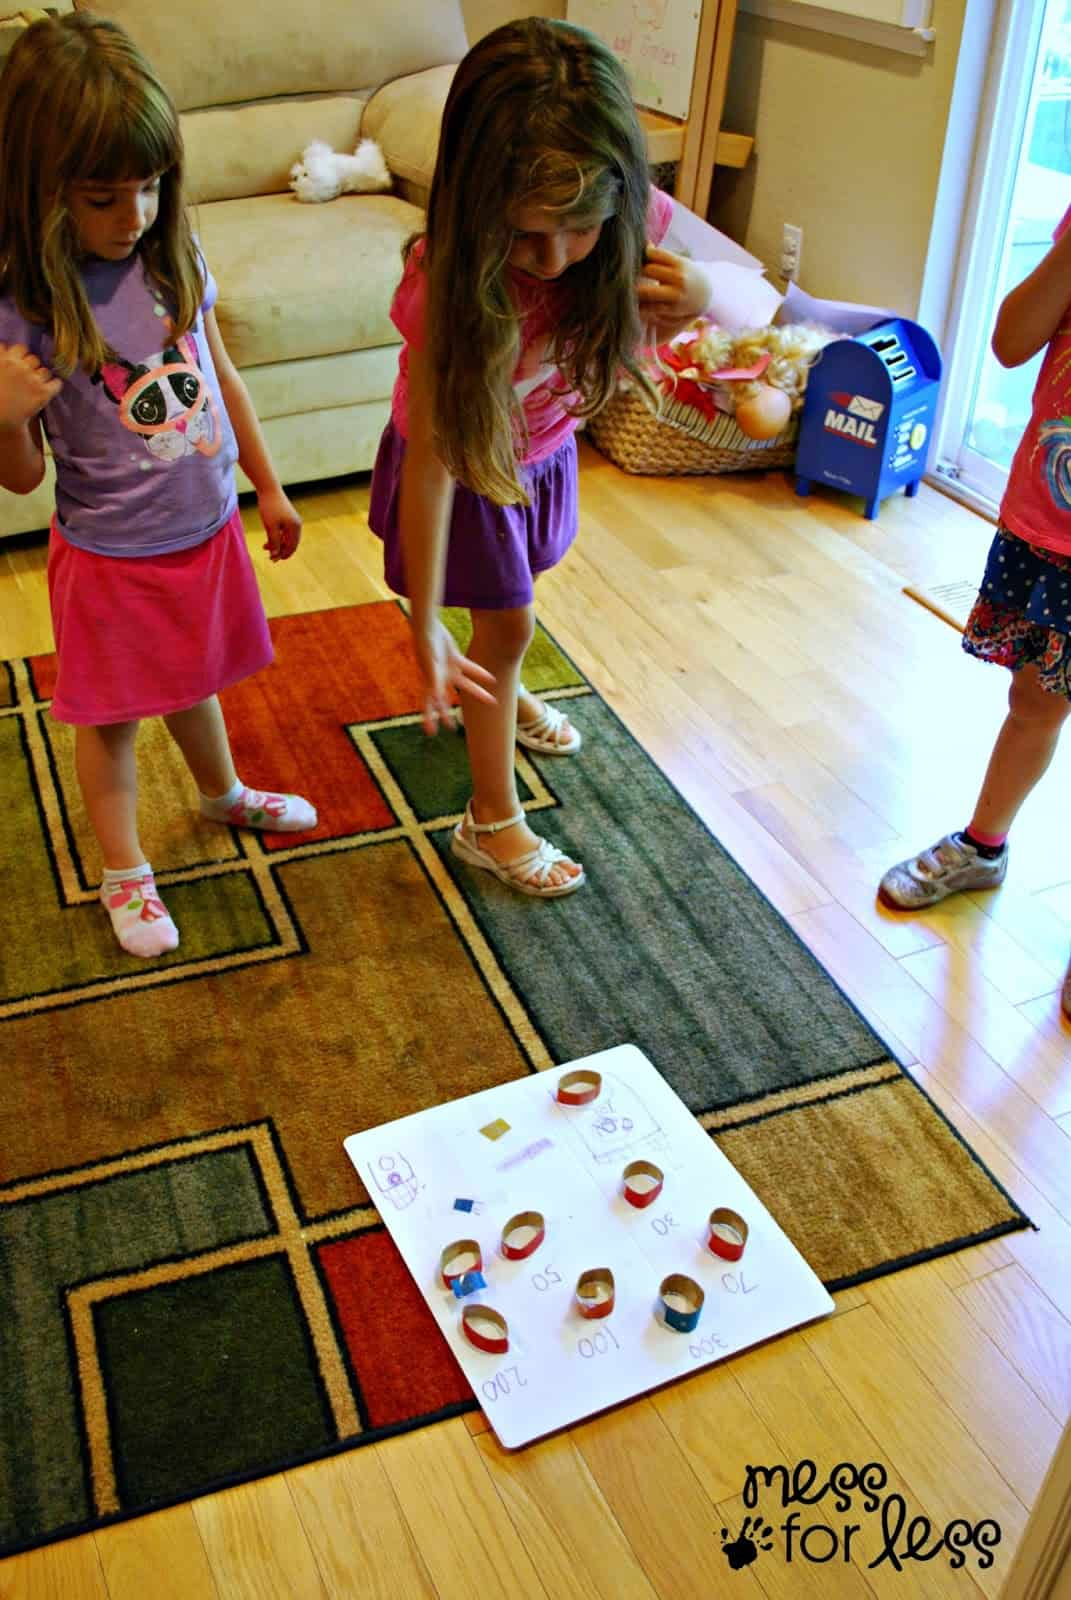 kids playing homemade game